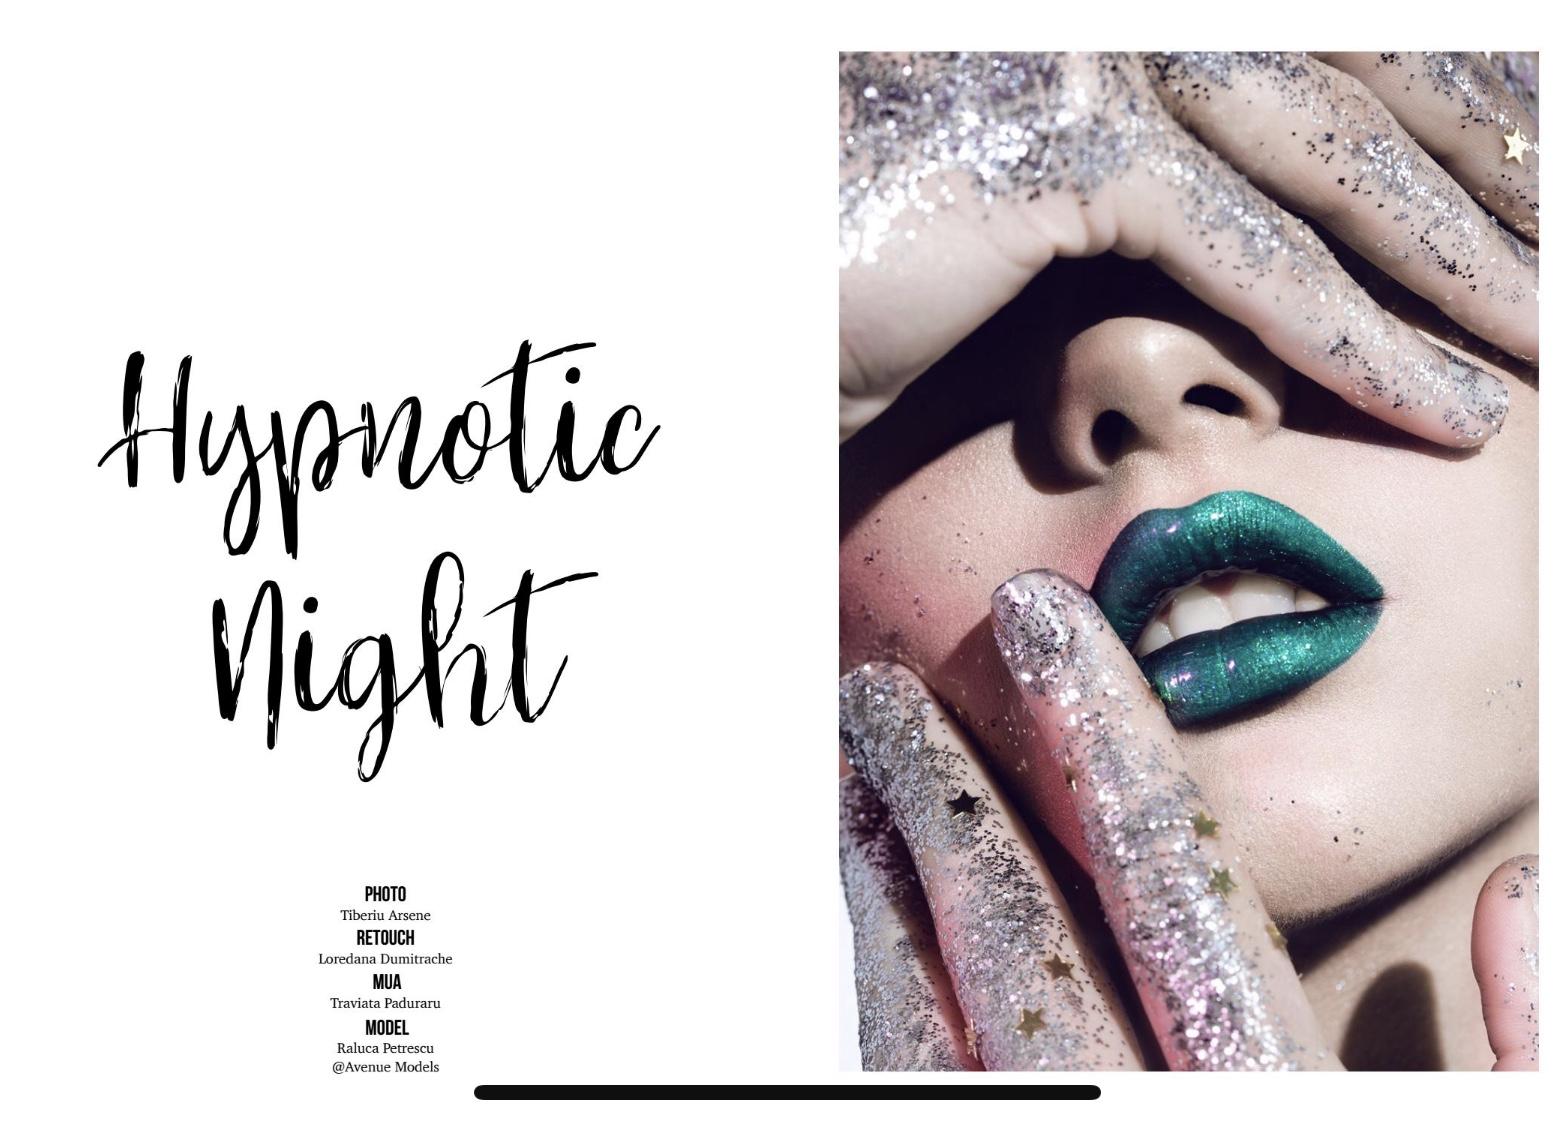 Hipnotic Night